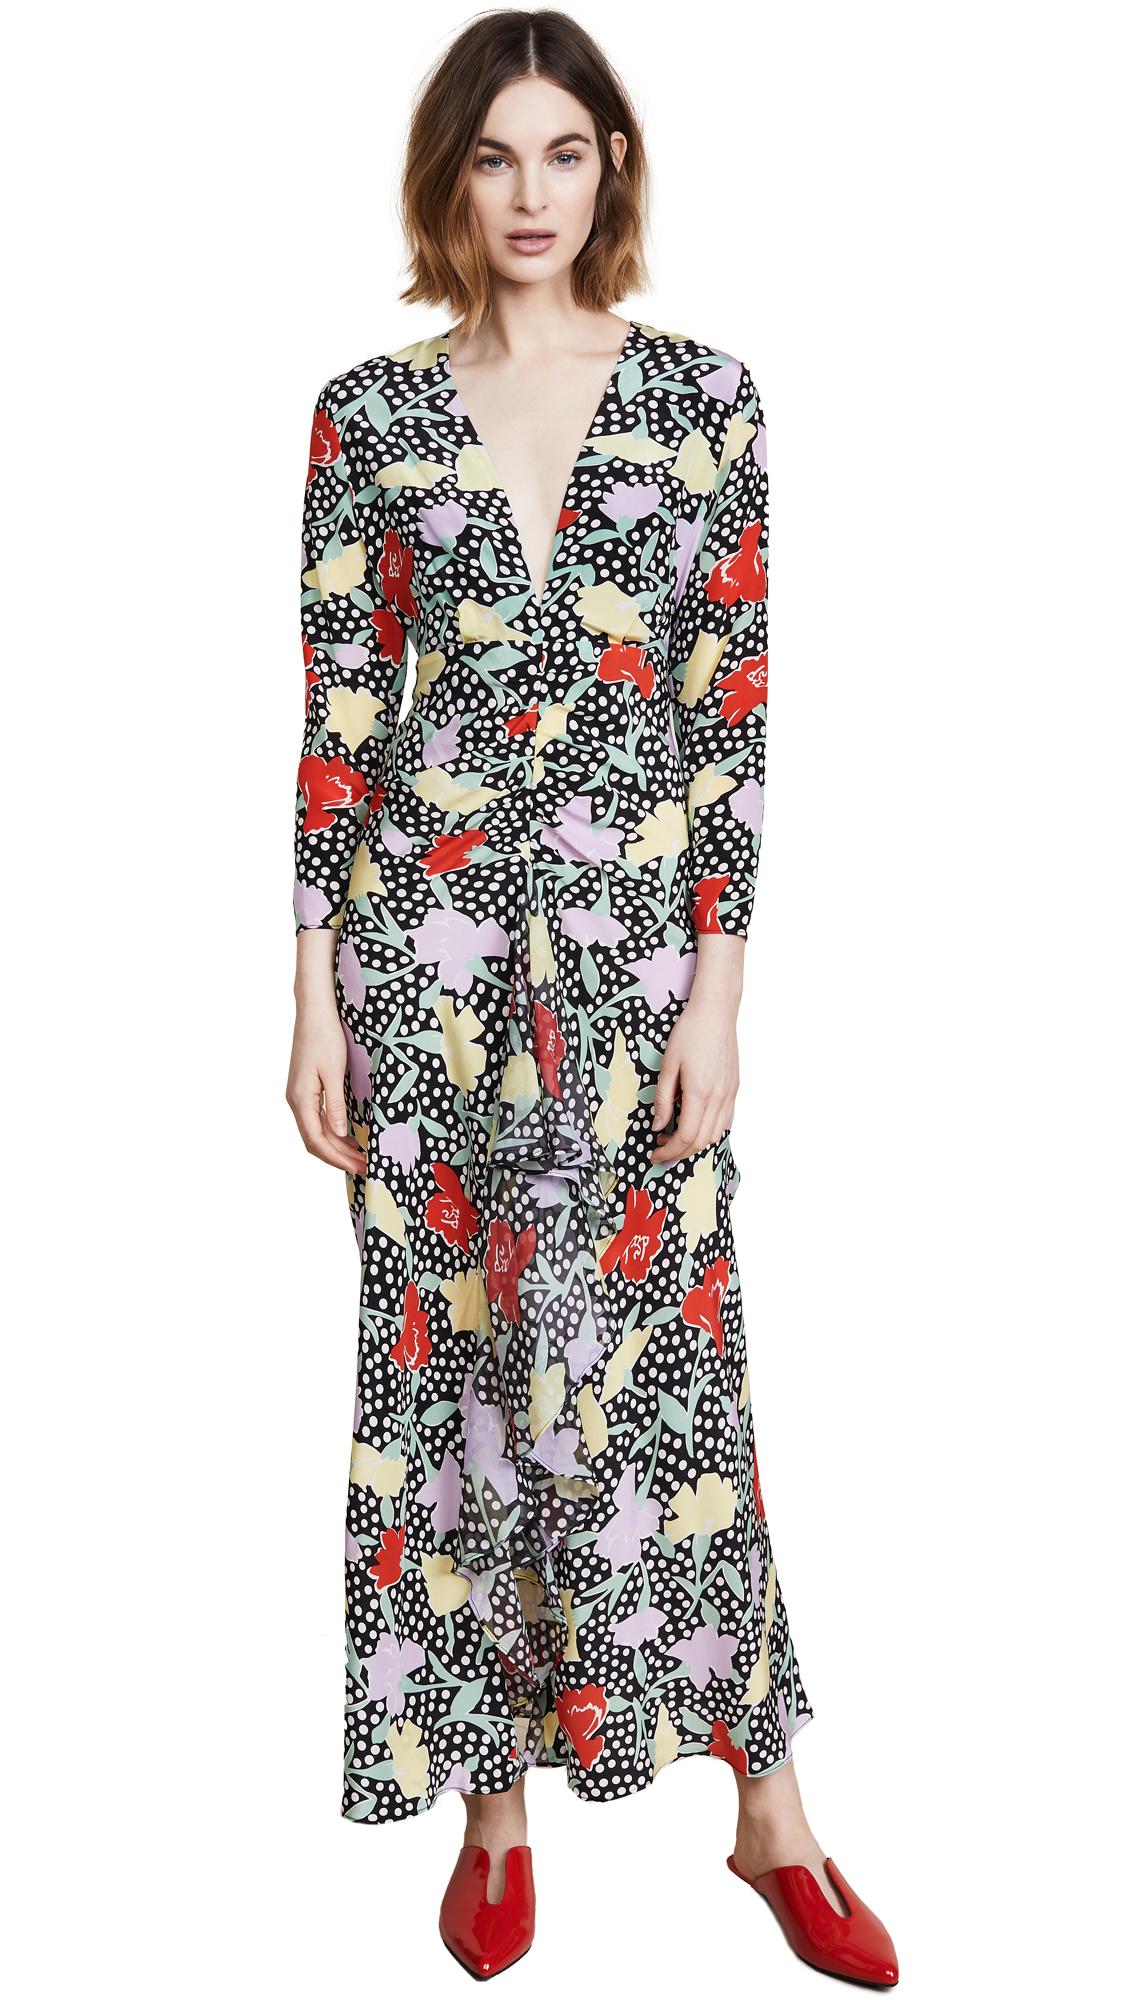 7619c0f0344 RIXO London Rose Dress | Coshio Online Shop